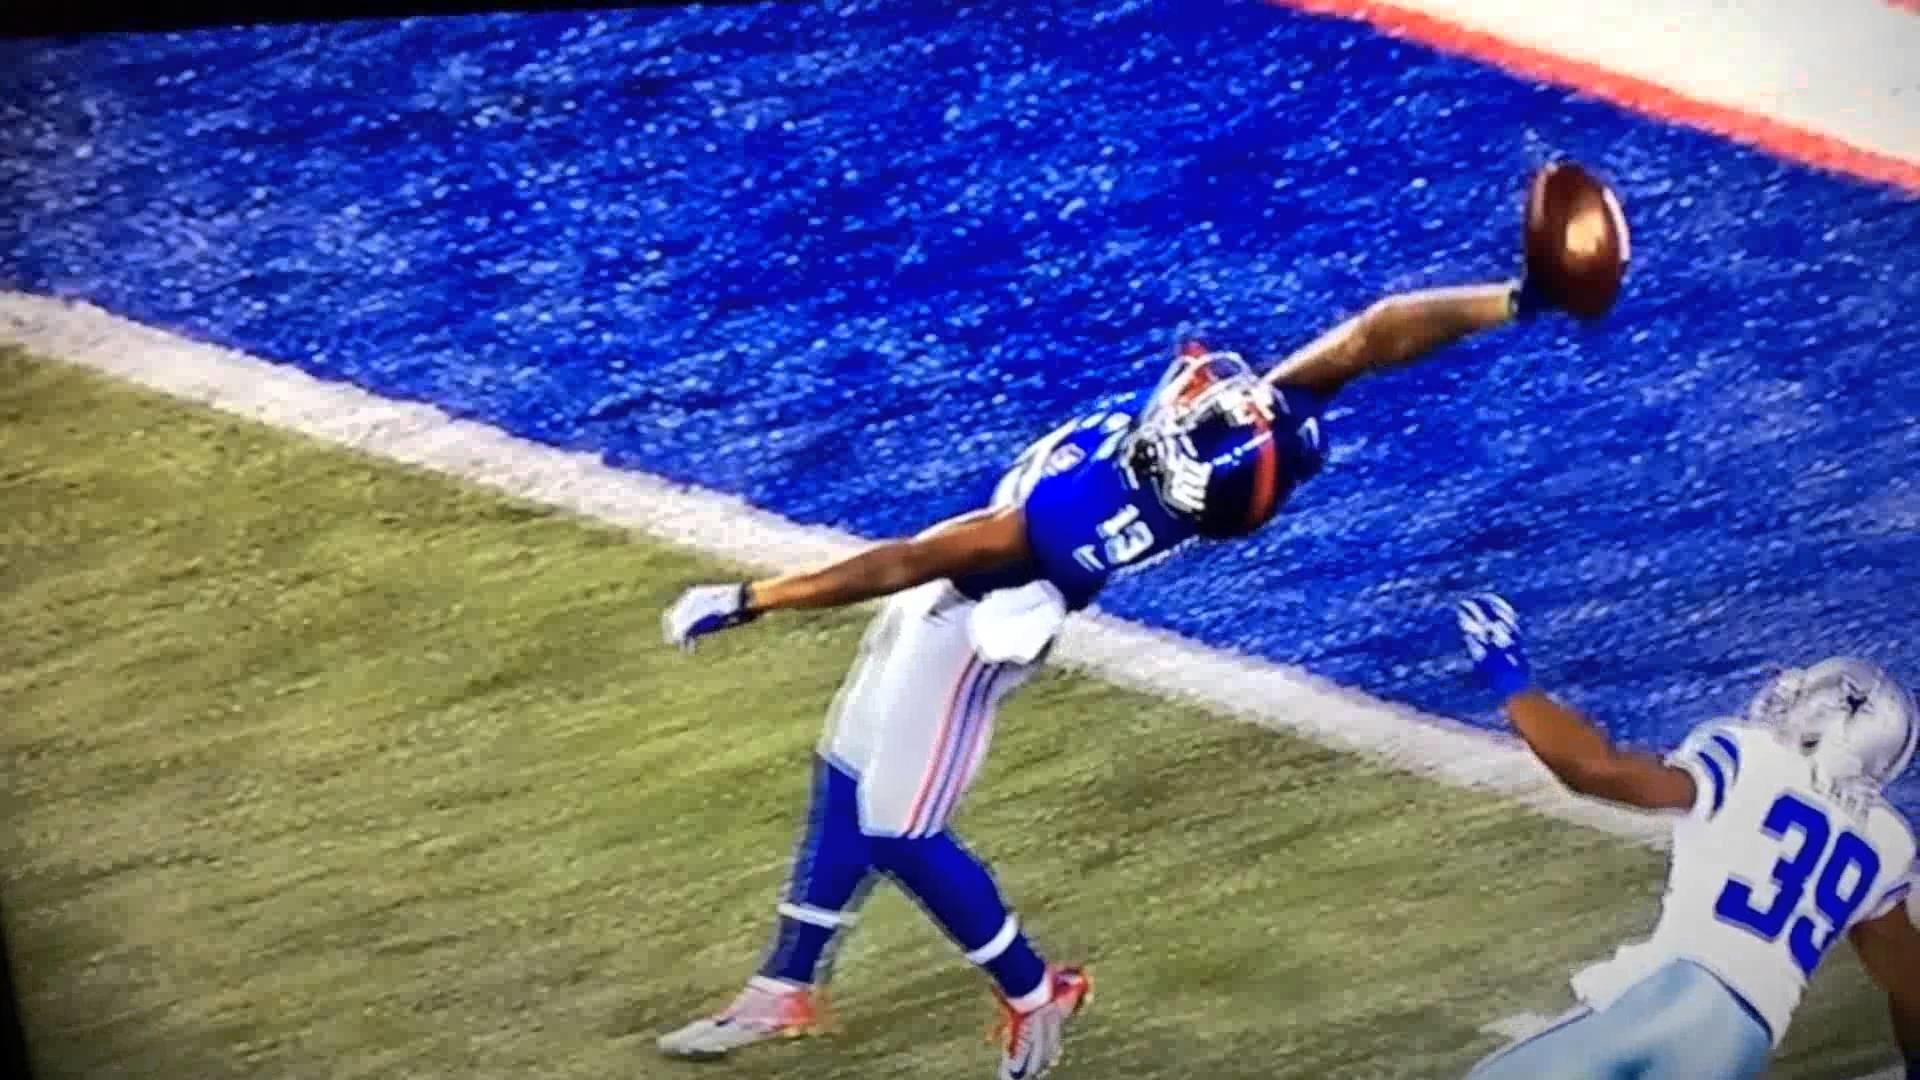 Amazing catch Odell beckham jr. Amazing catch